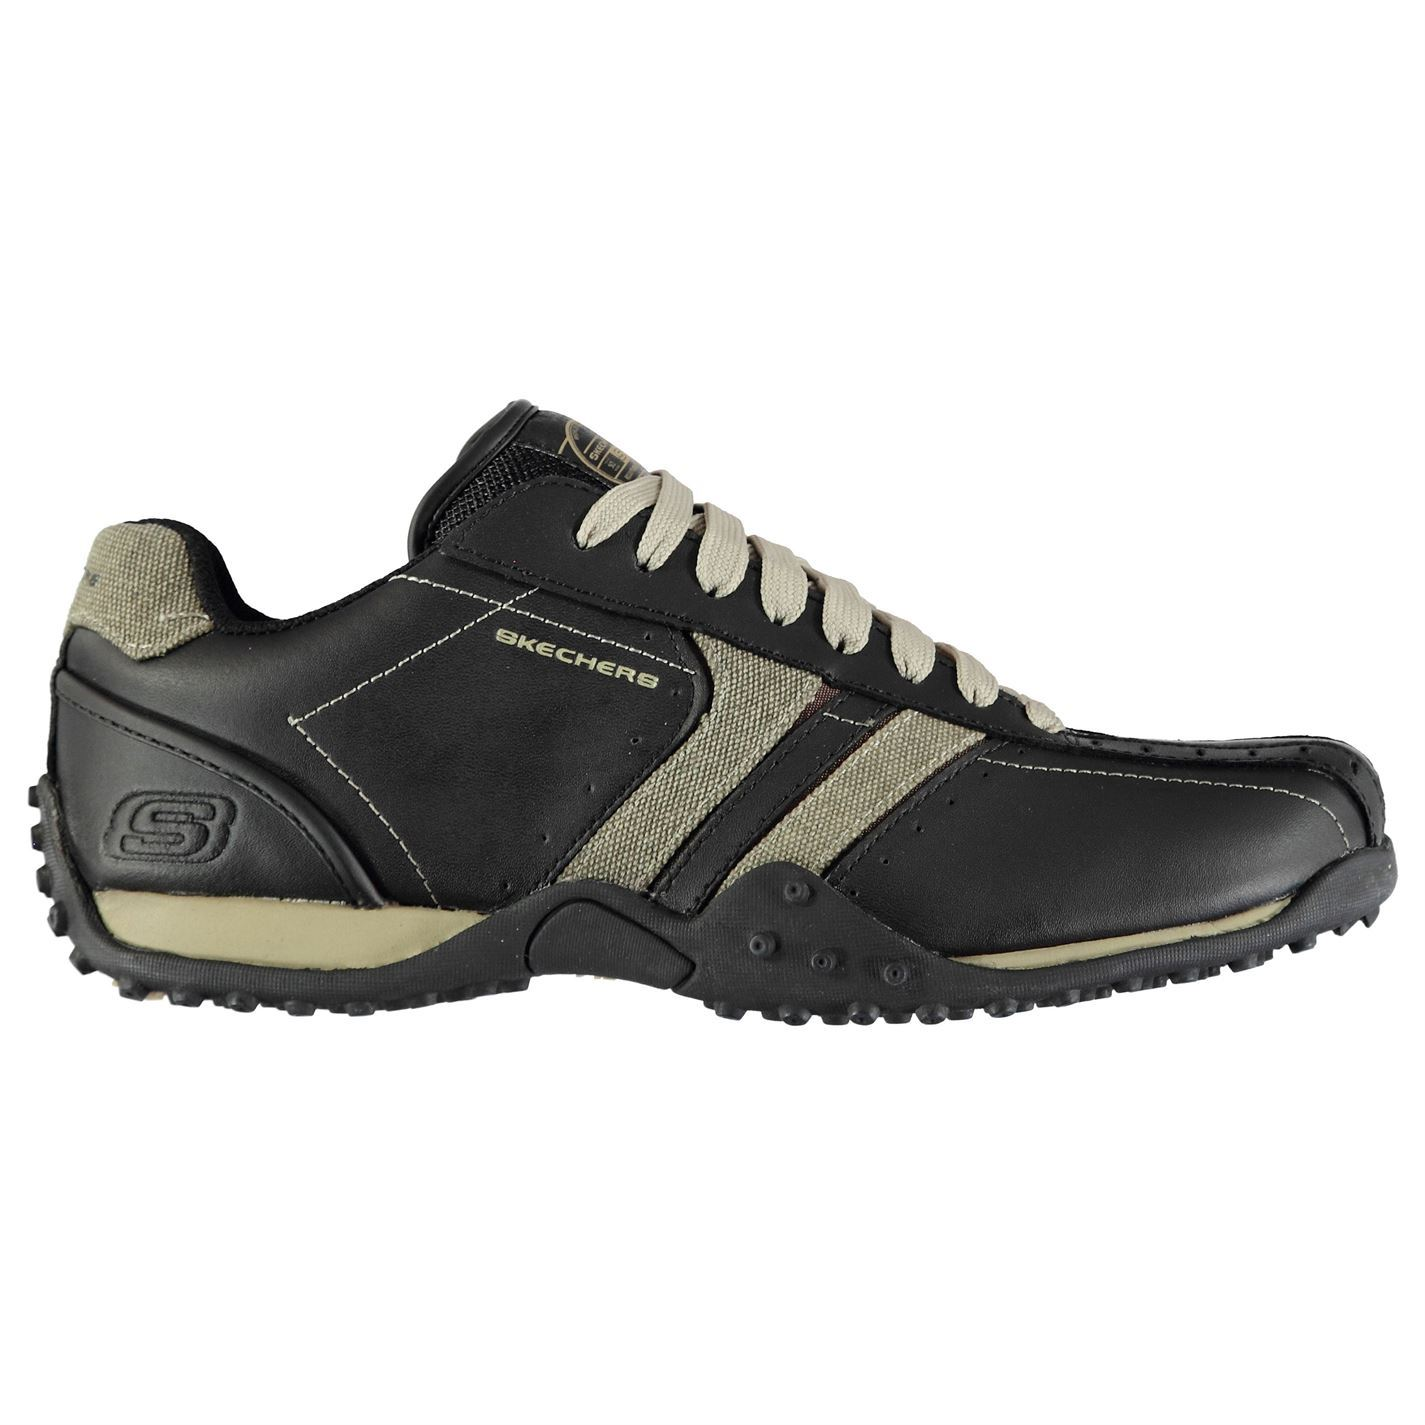 Skechers-Urban-Track-Forward-Trainers-Mens-Athleisure-Footwear-Shoes-Sneakers thumbnail 9